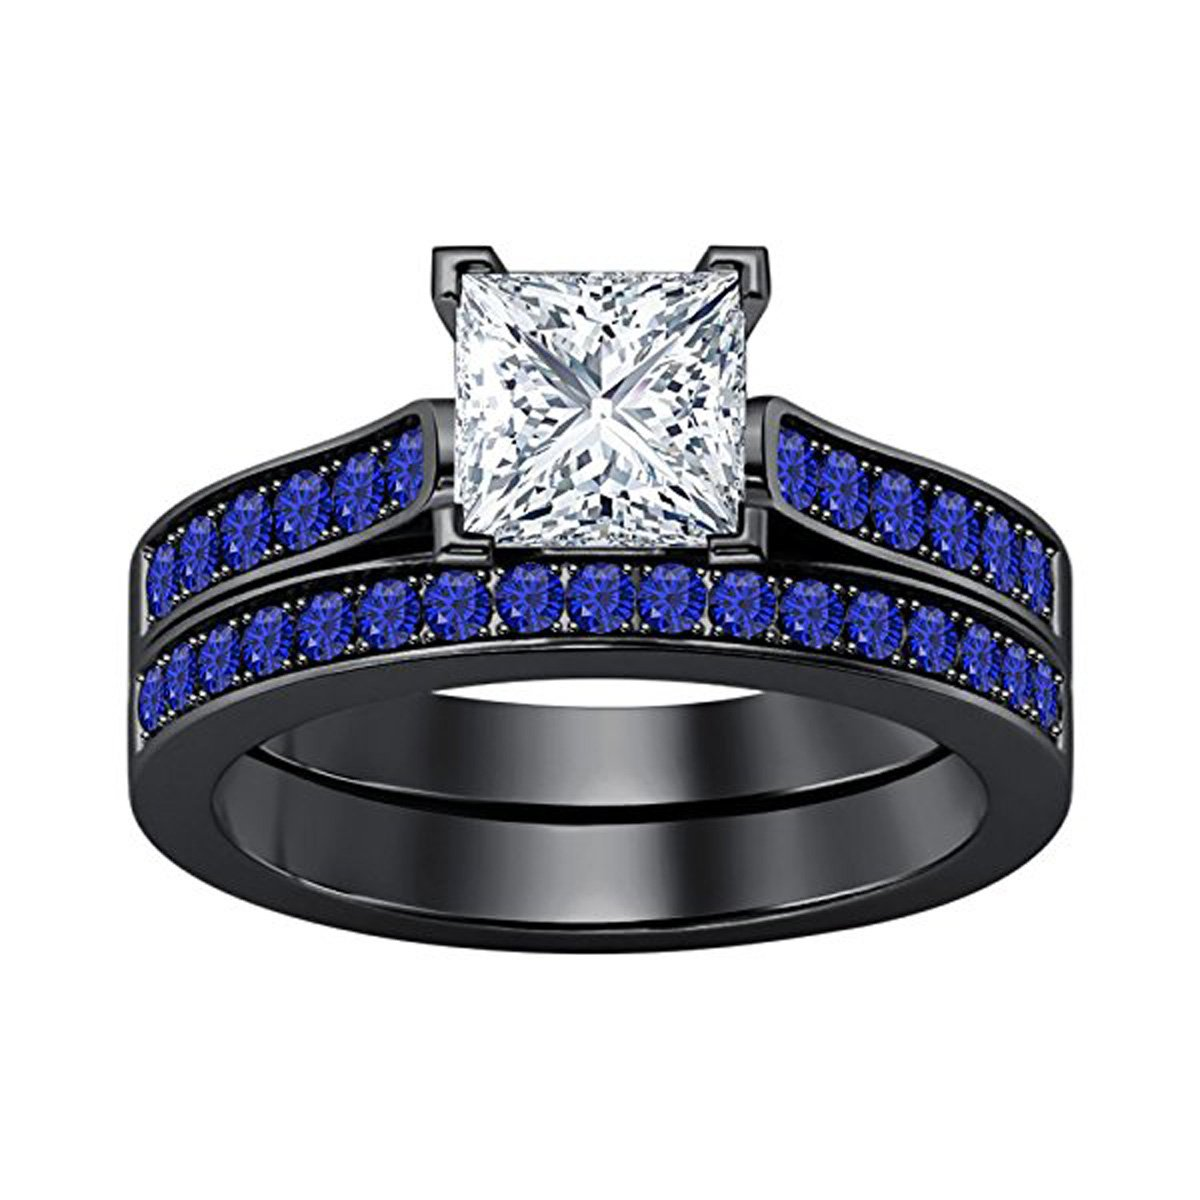 2.75 Ct Princess Cut White CZ & Created Blue Sapphire Wedding Band Engagement Bridal Ring Set Black Rhodium Plated Women's Jewelry